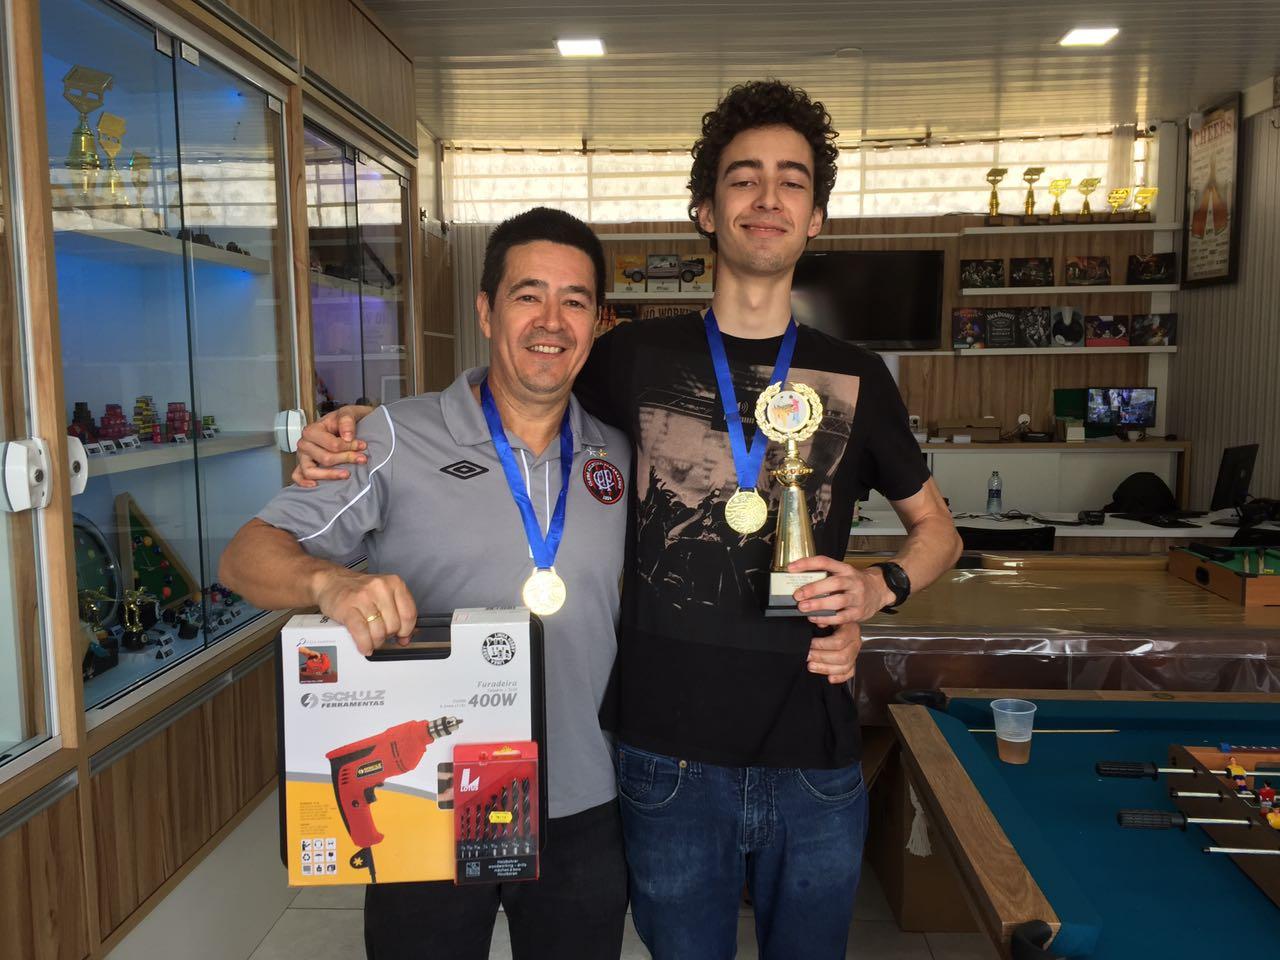 A dupla campeã do torneio foi Victor Esteche e Victor Esteche Filho.